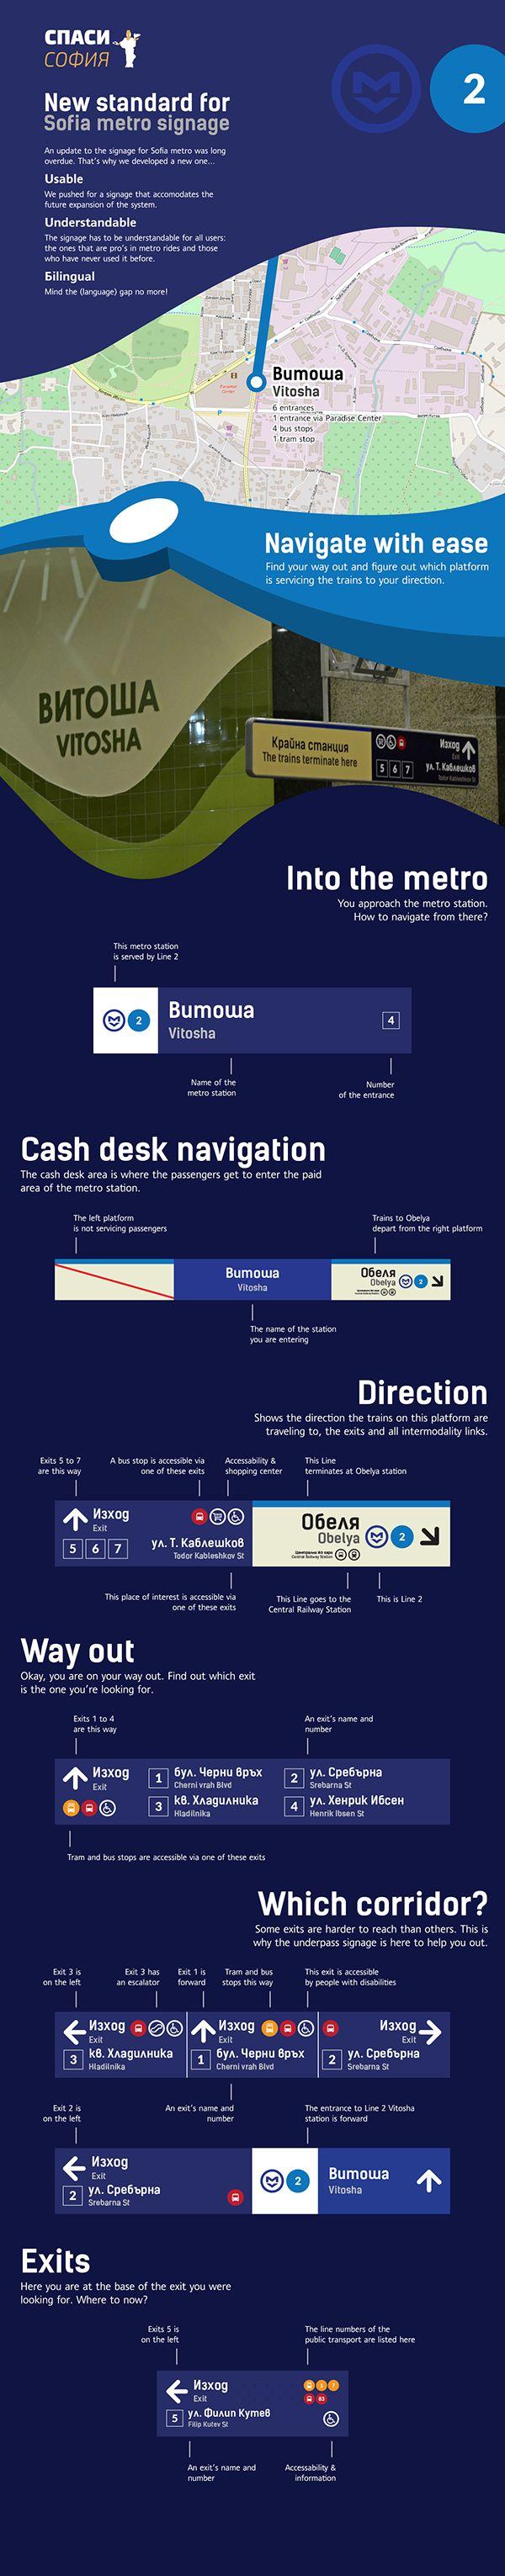 Visual information for Sofia metro